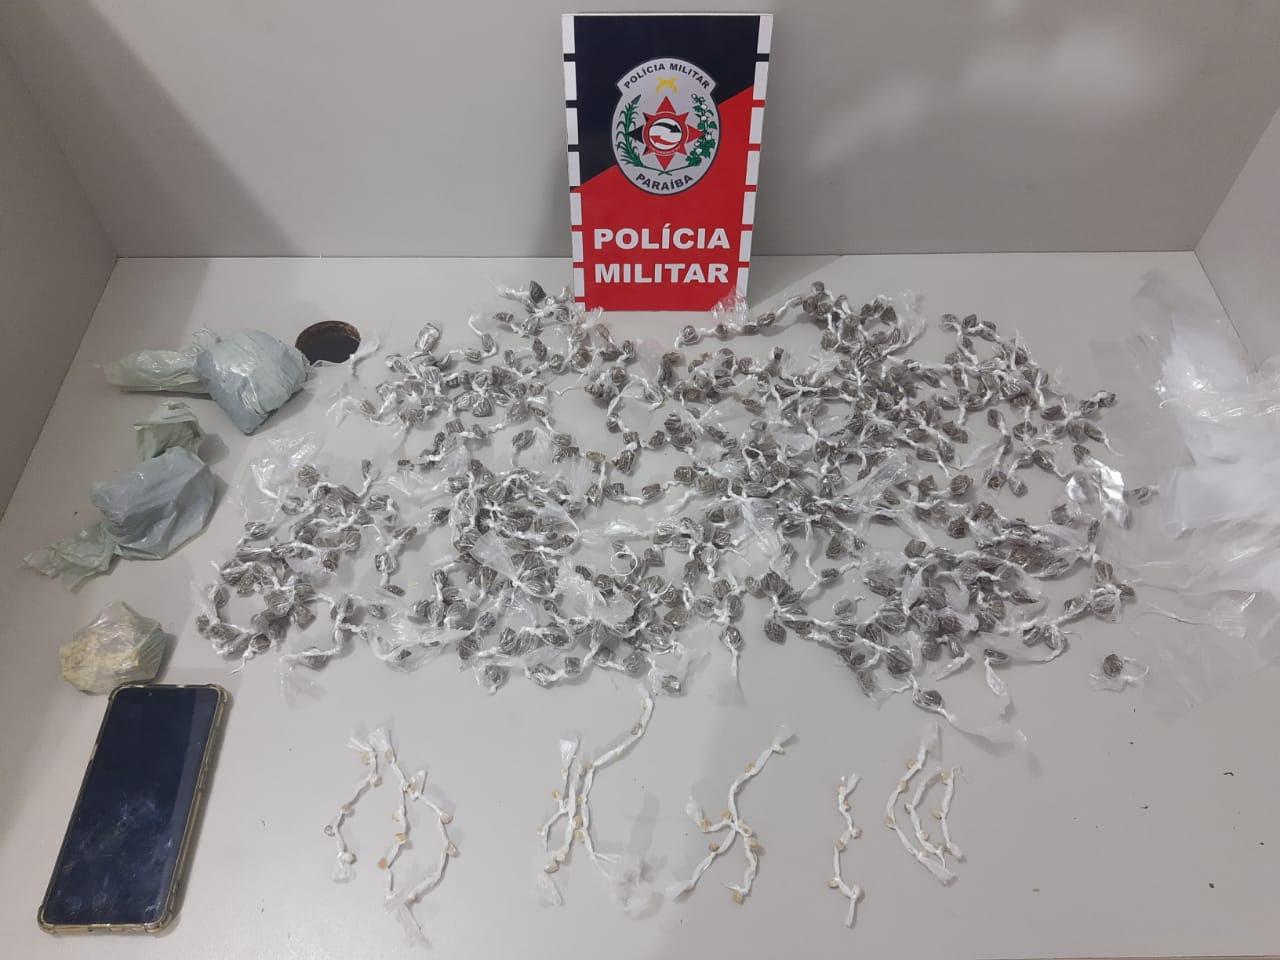 Paraíba Online • Polícia prende dupla por roubo e porte ilegal de arma e drogas na PB